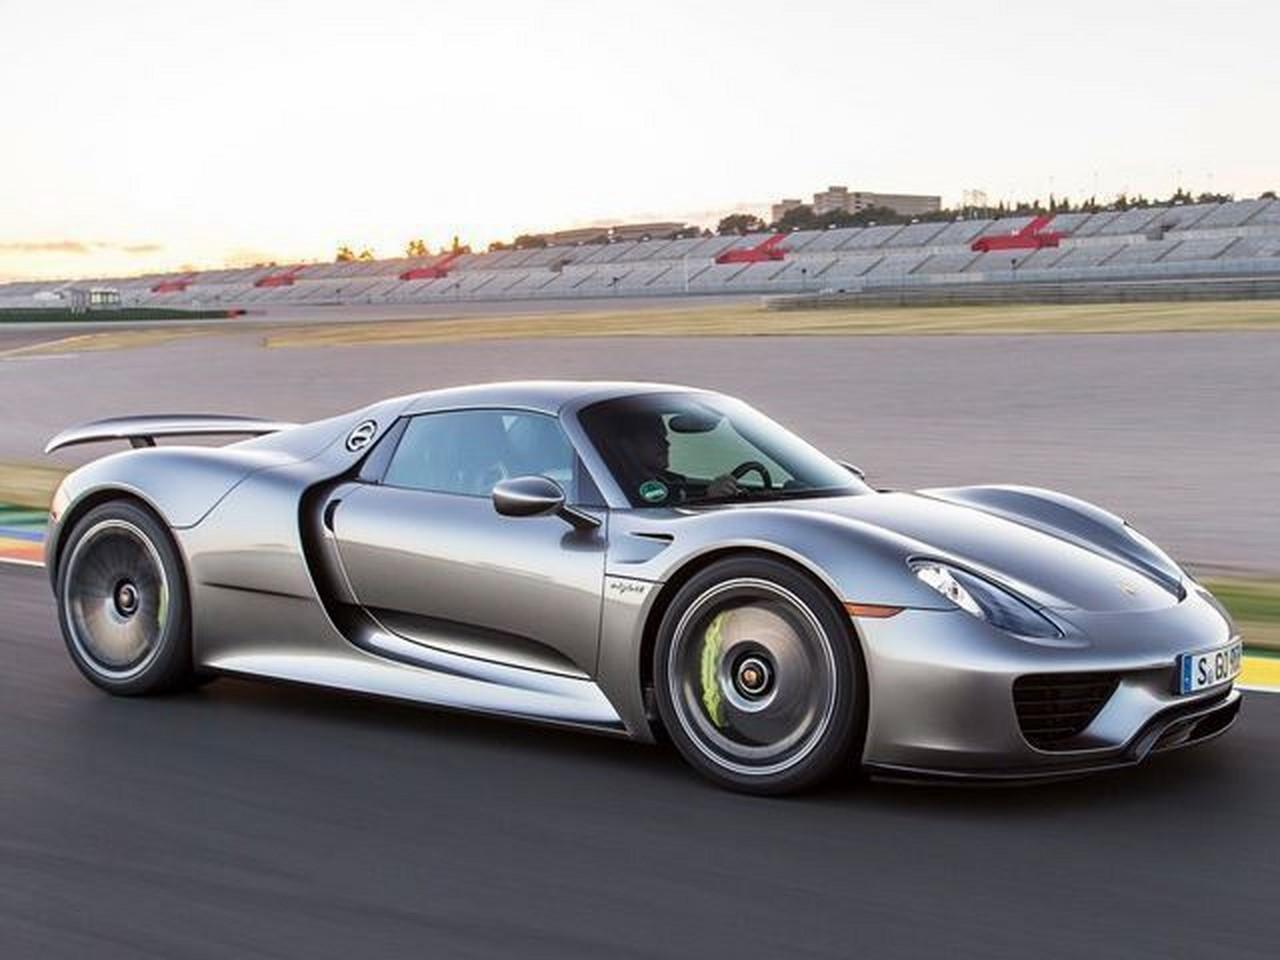 Porsche 918 Spyder : d'où viennent les acheteurs ?